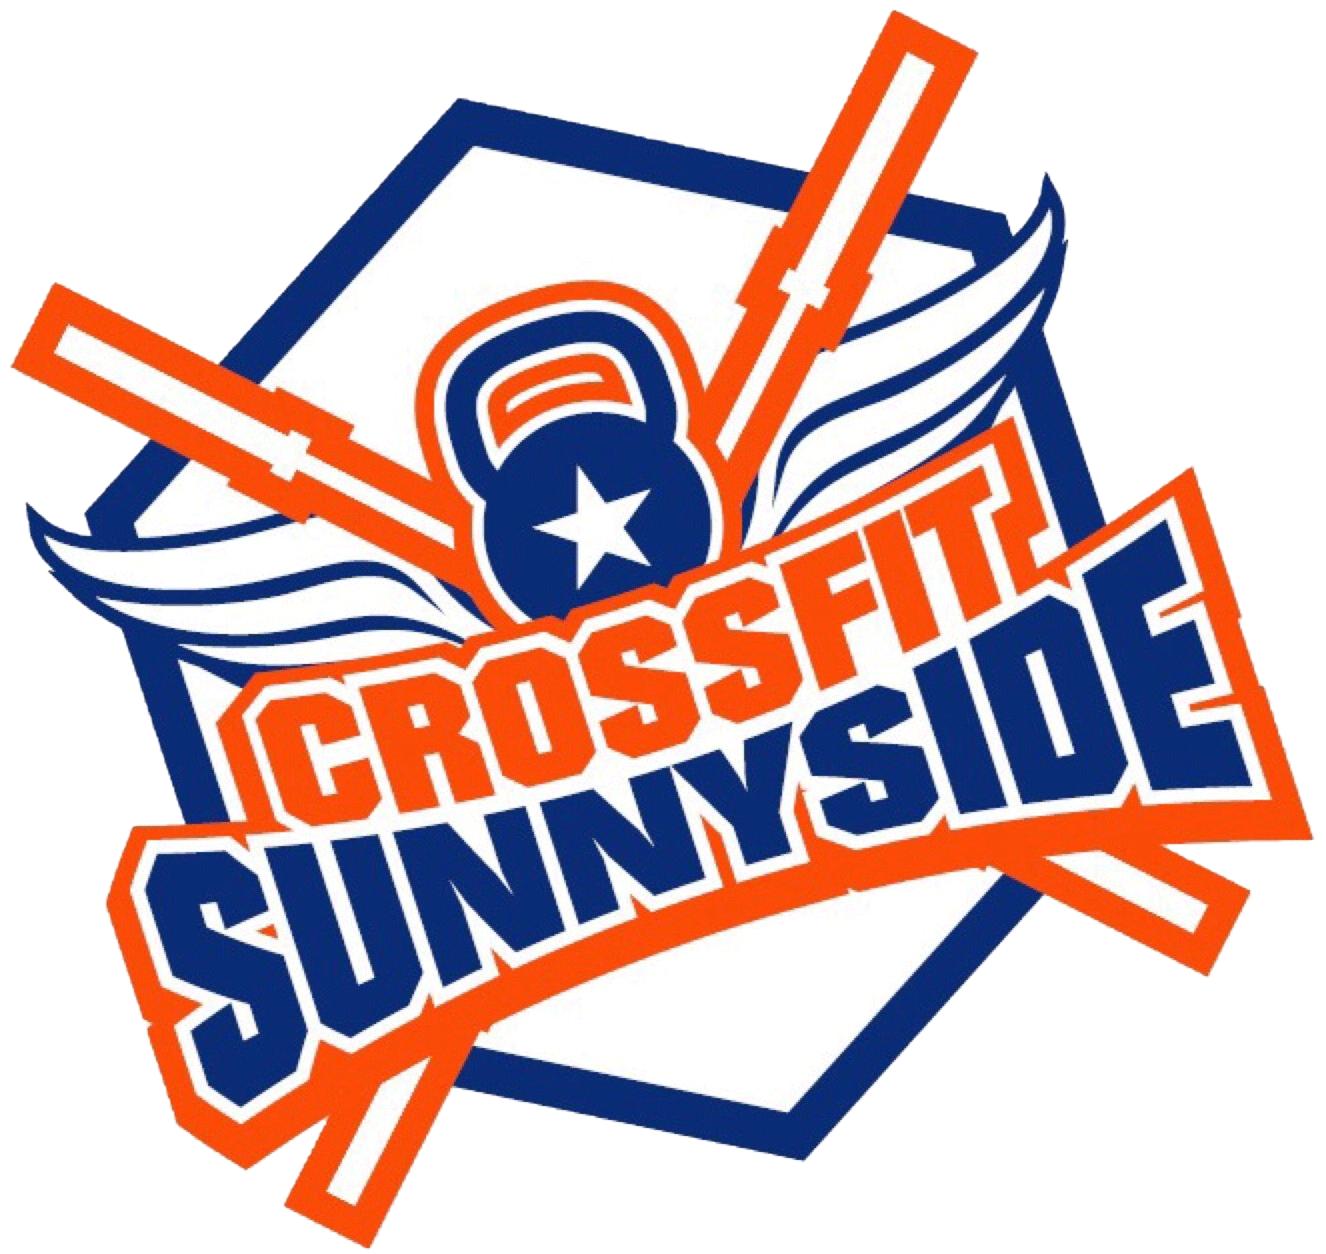 CrossFit Sunnyside logo